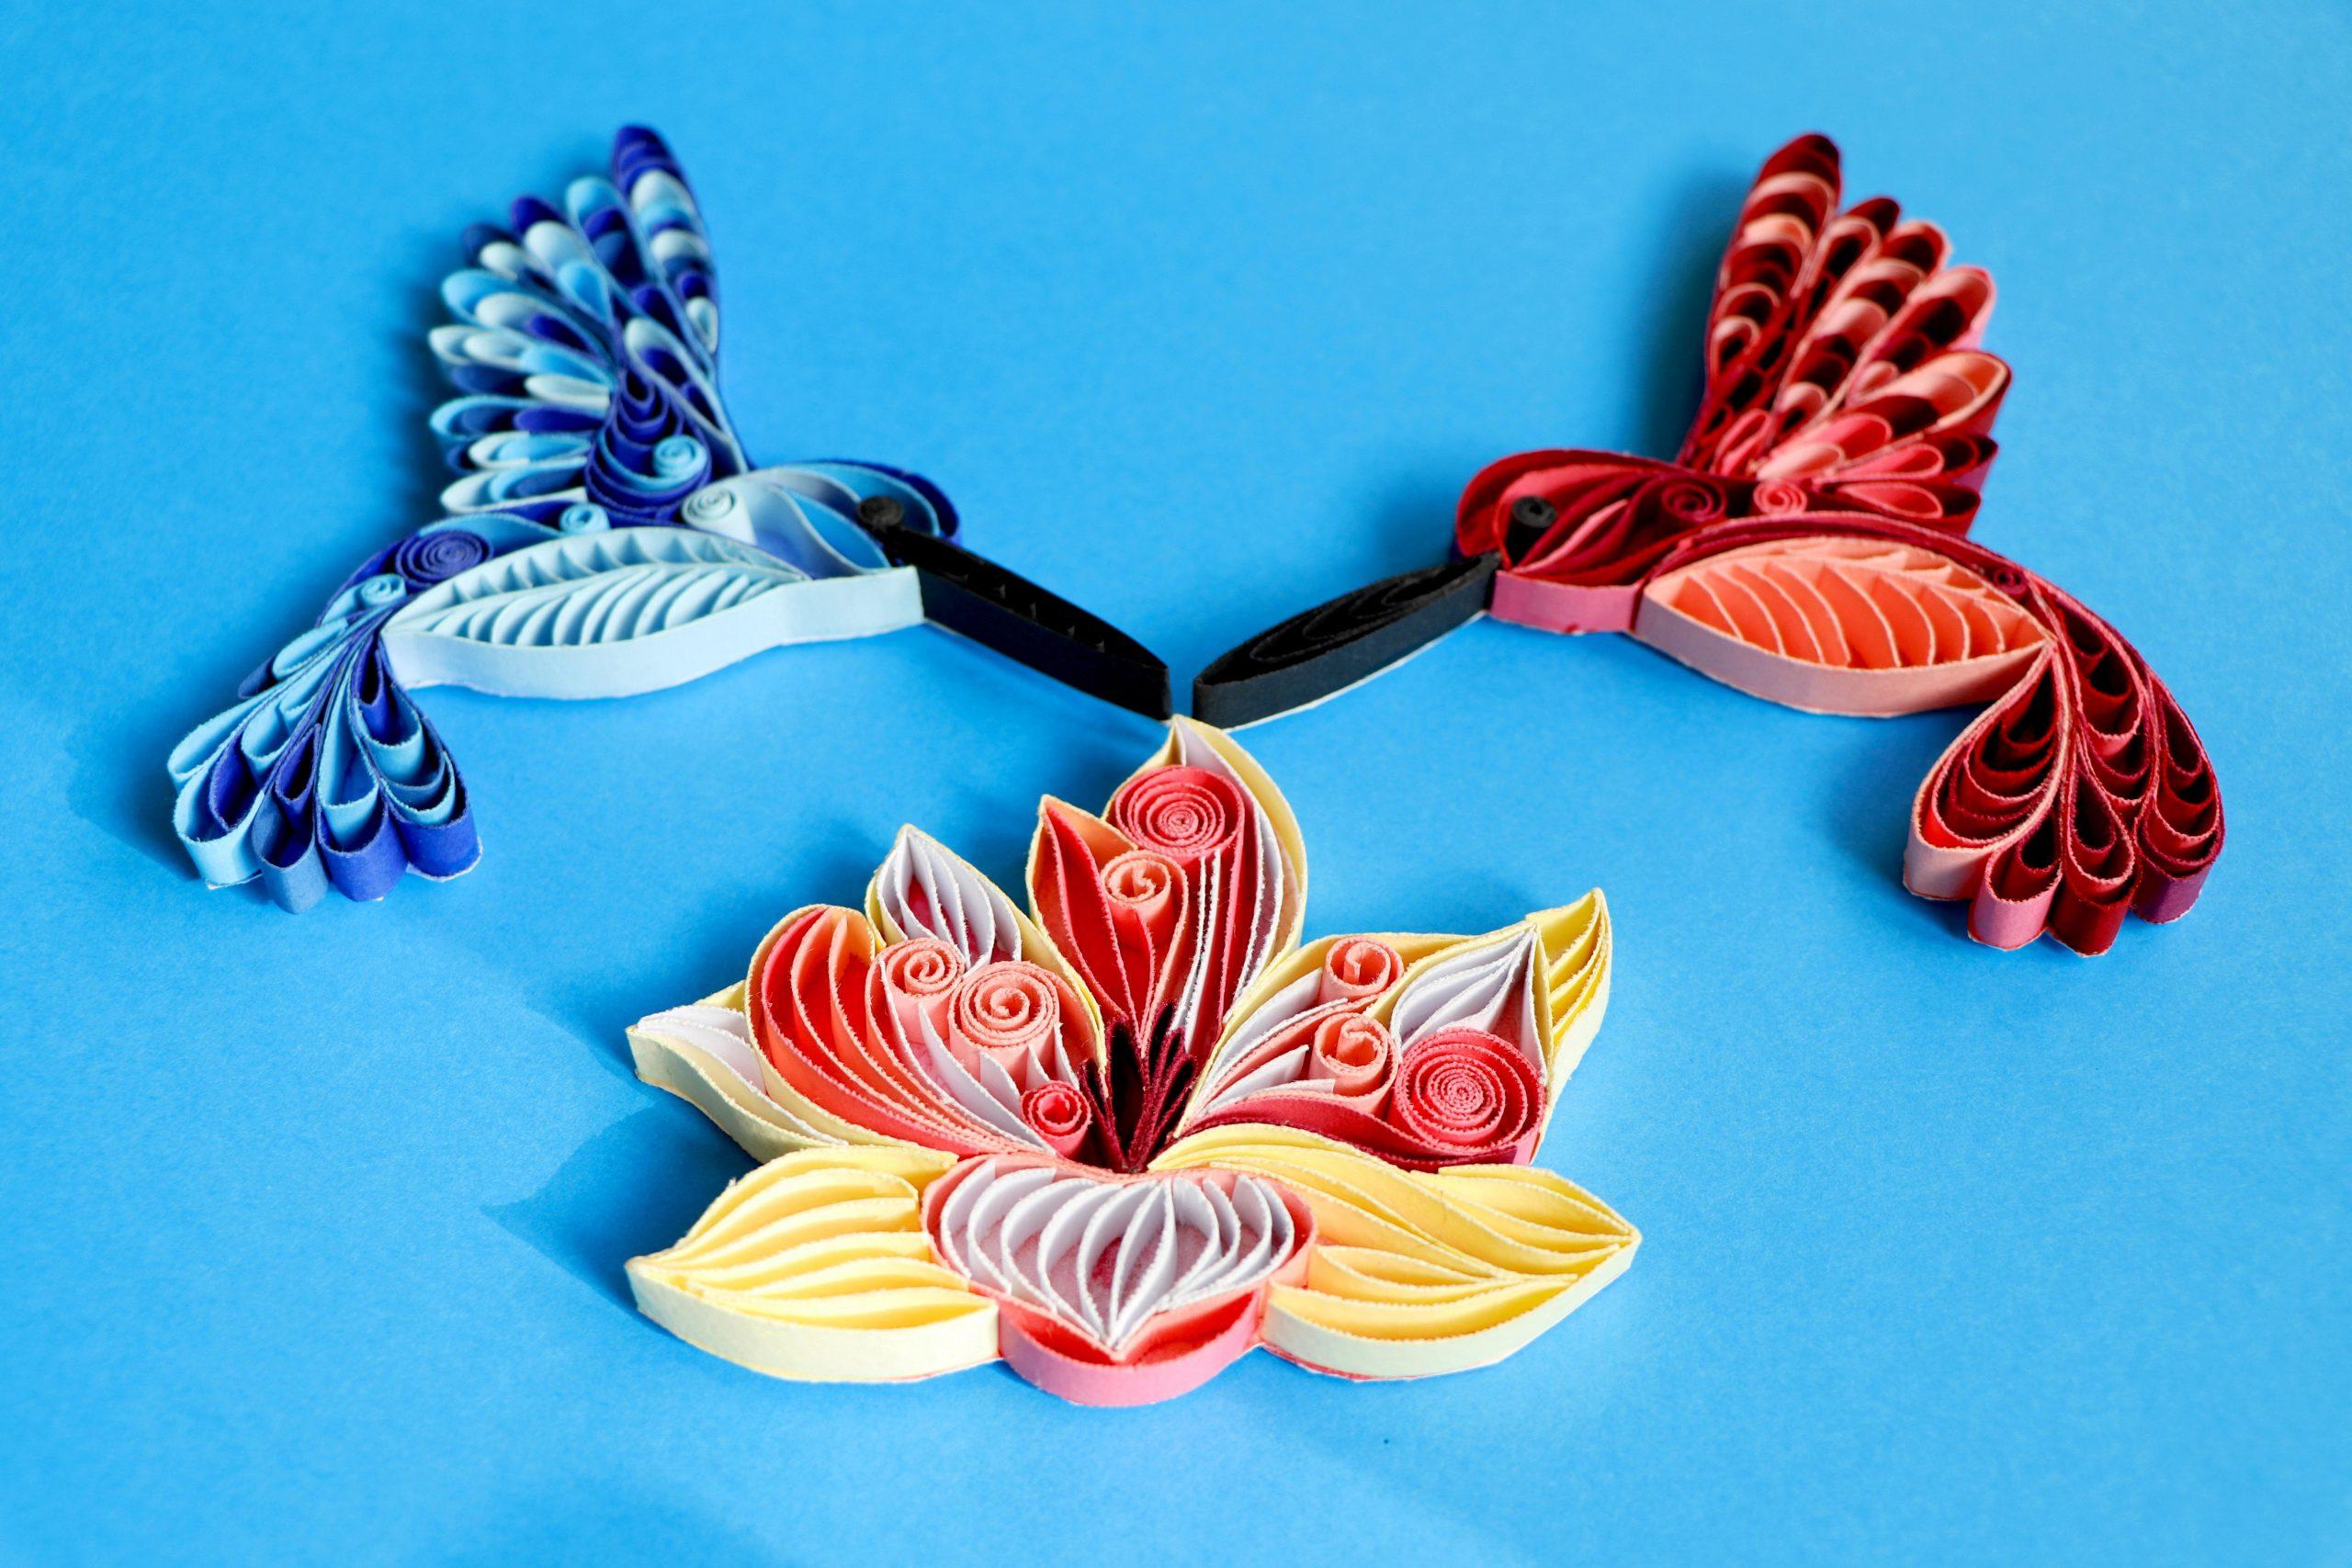 ywdvlq2kwkj61 scaled - Hummingbirds in love ❤️ - hobbies, crafts